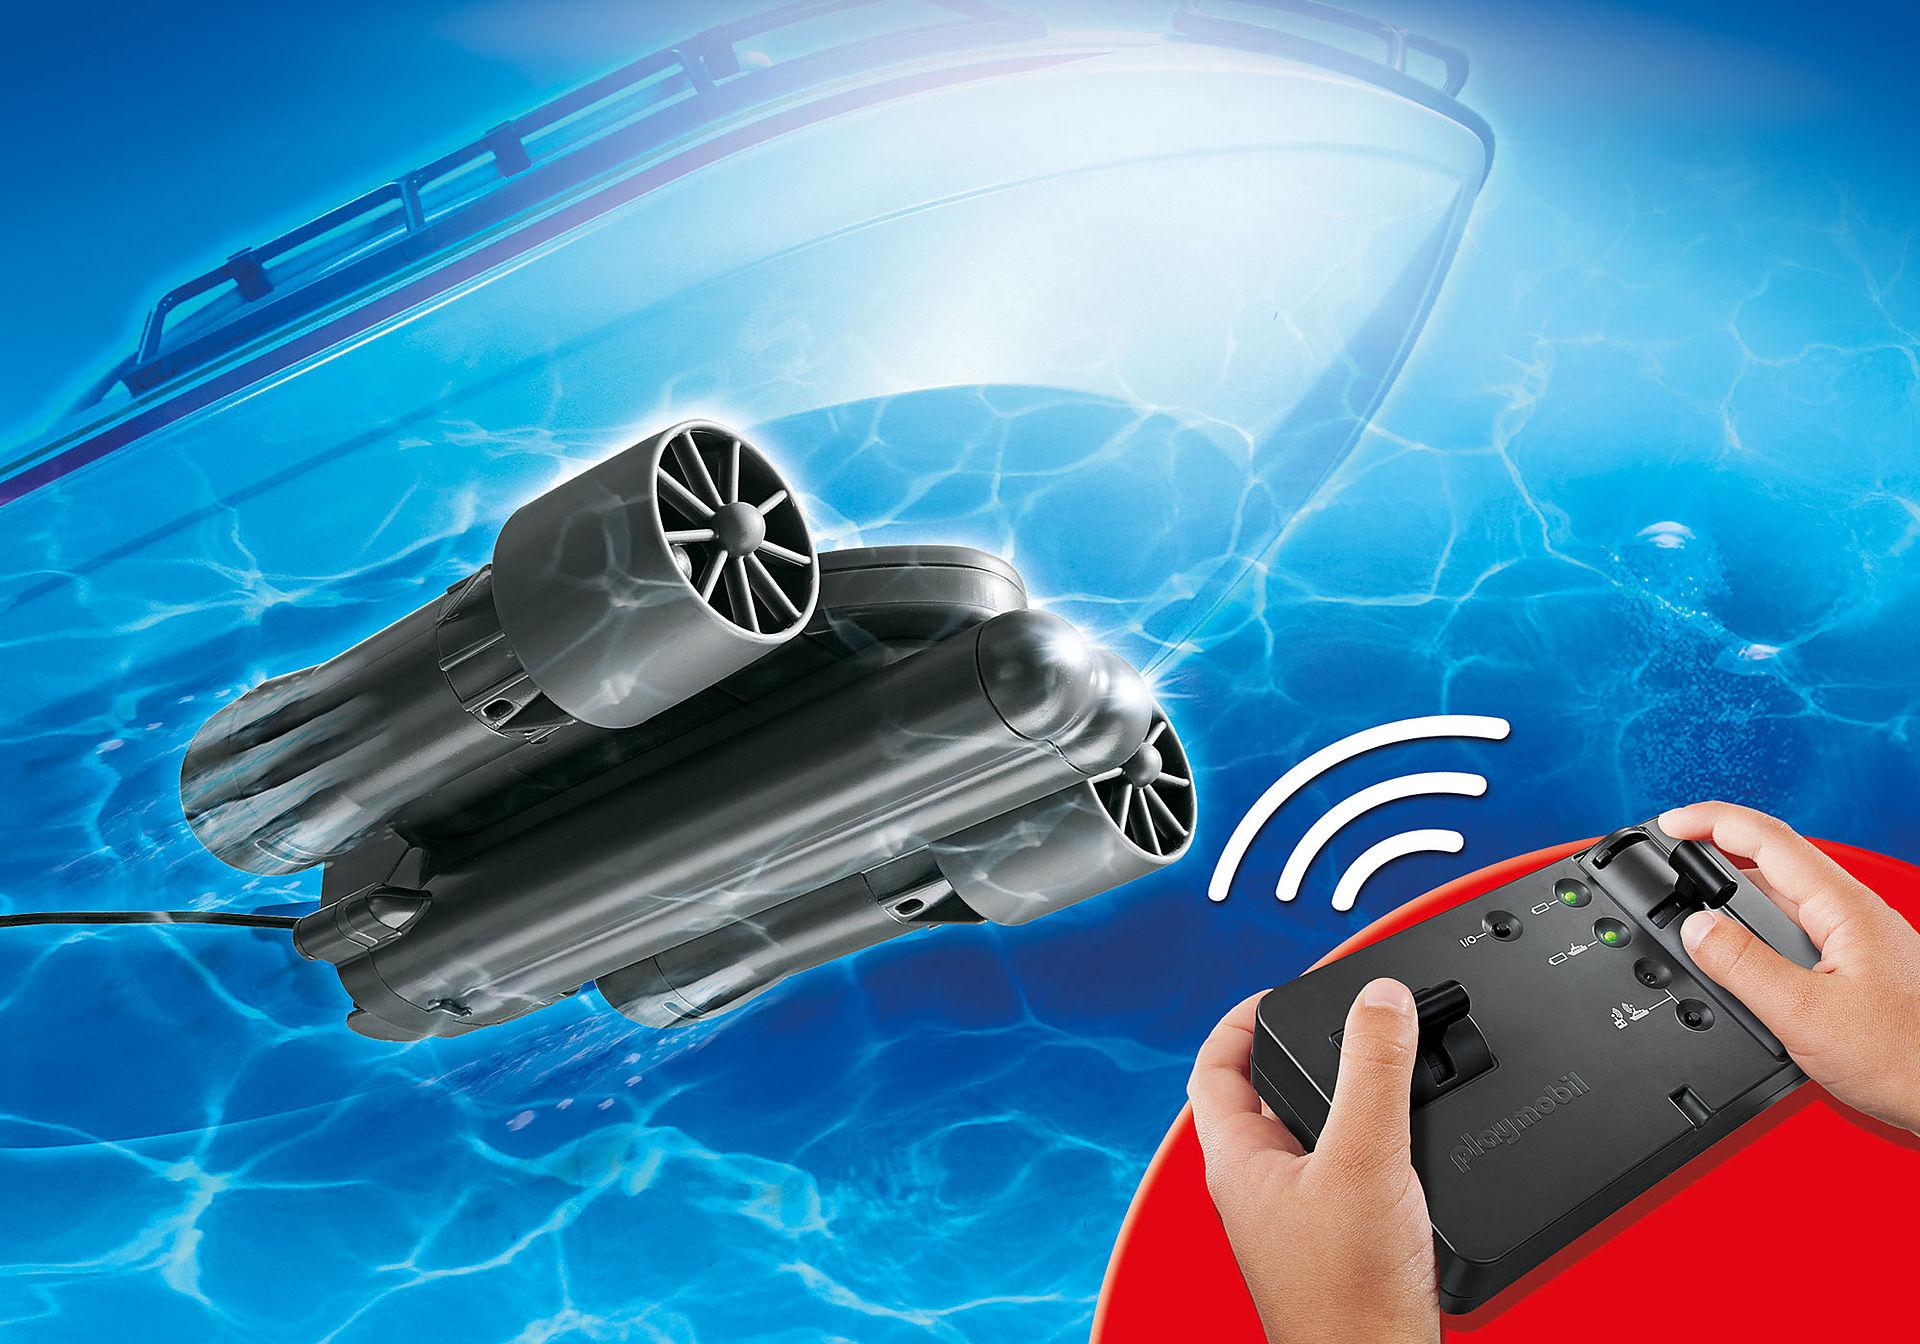 http://media.playmobil.com/i/playmobil/9853_product_detail/Motor submarino RC